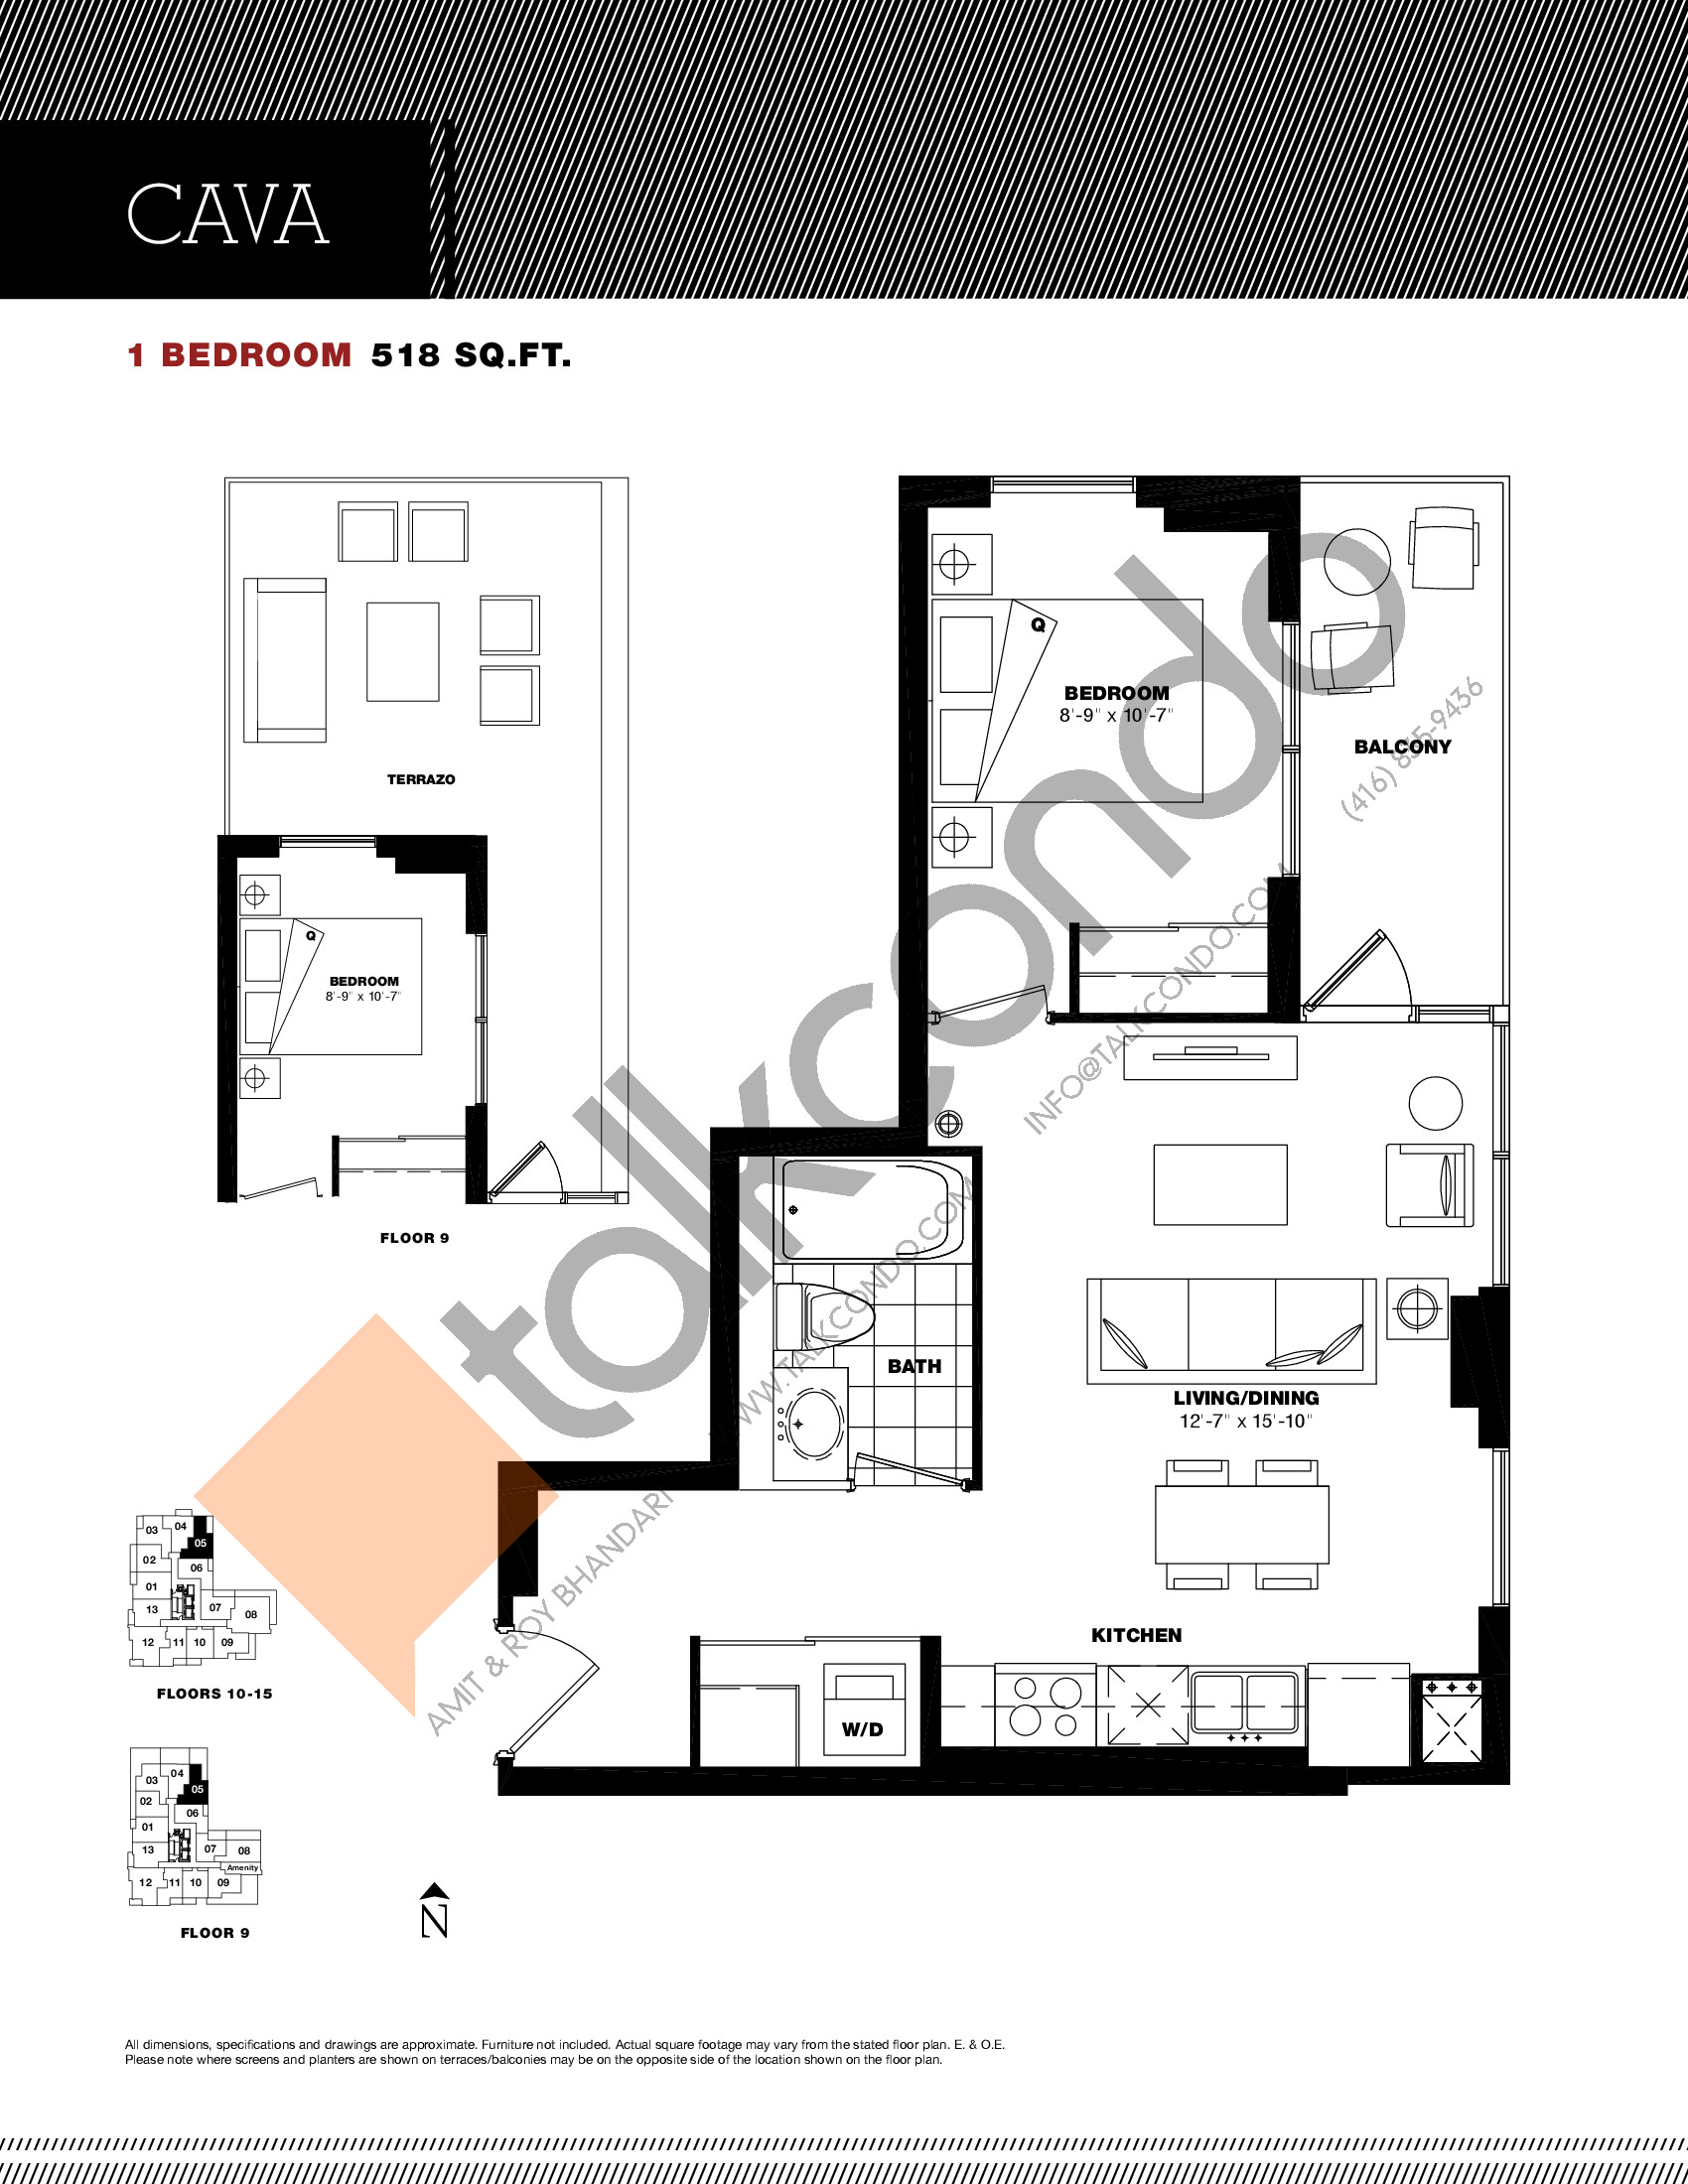 Cava Floor Plan at Residenze Palazzo at Treviso 3 Condos - 518 sq.ft